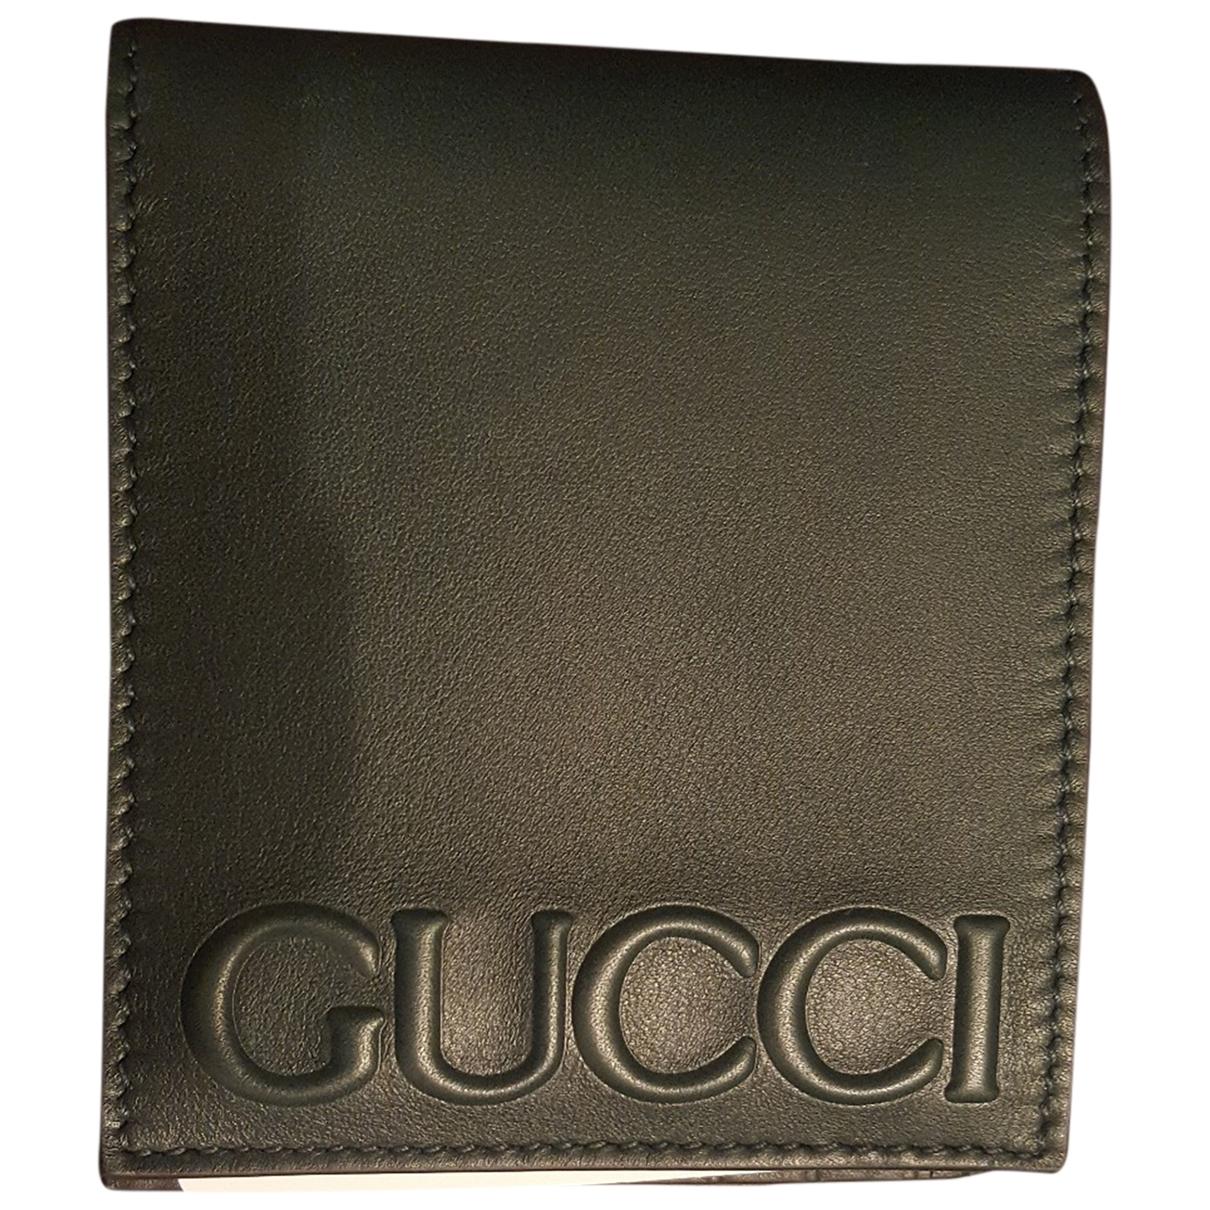 Gucci \N Kleinlederwaren in  Gruen Leder